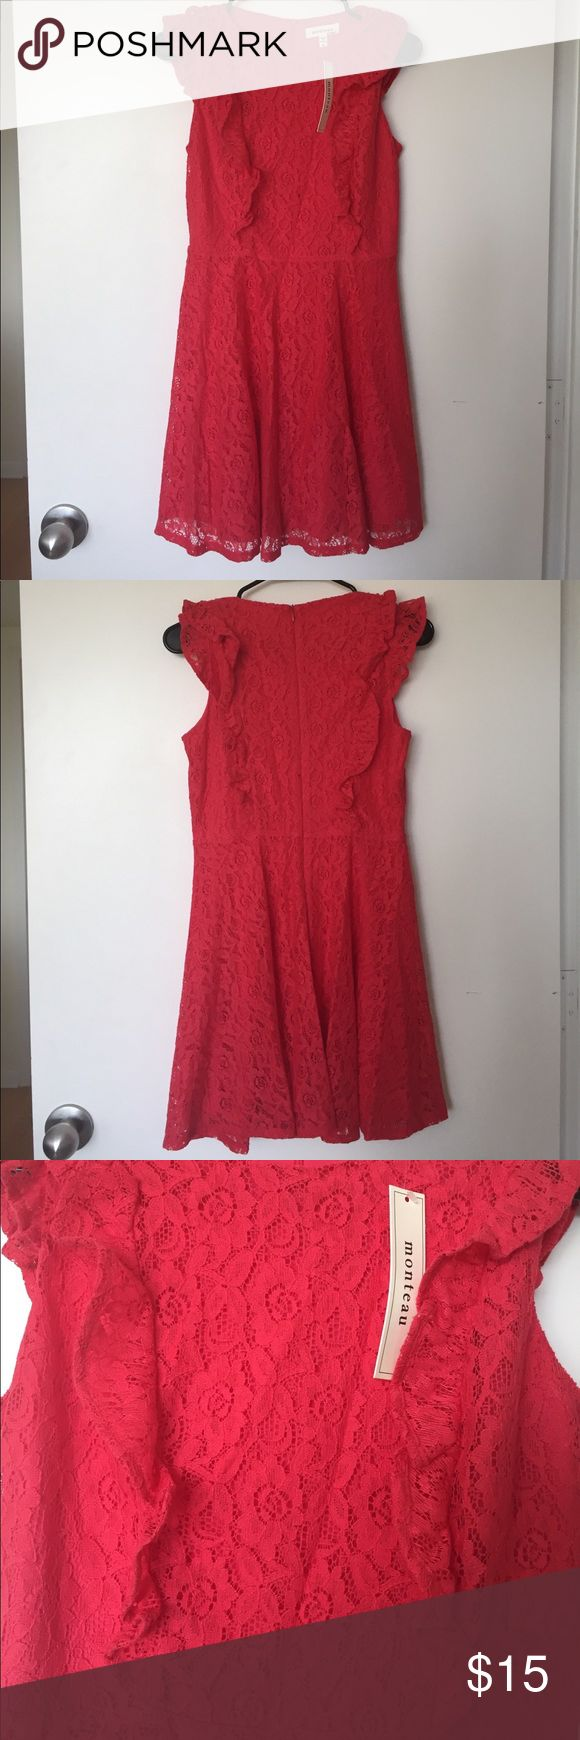 Coral lace dress Adorable coral lace dress, size small, NWT Monteau Dresses Mini